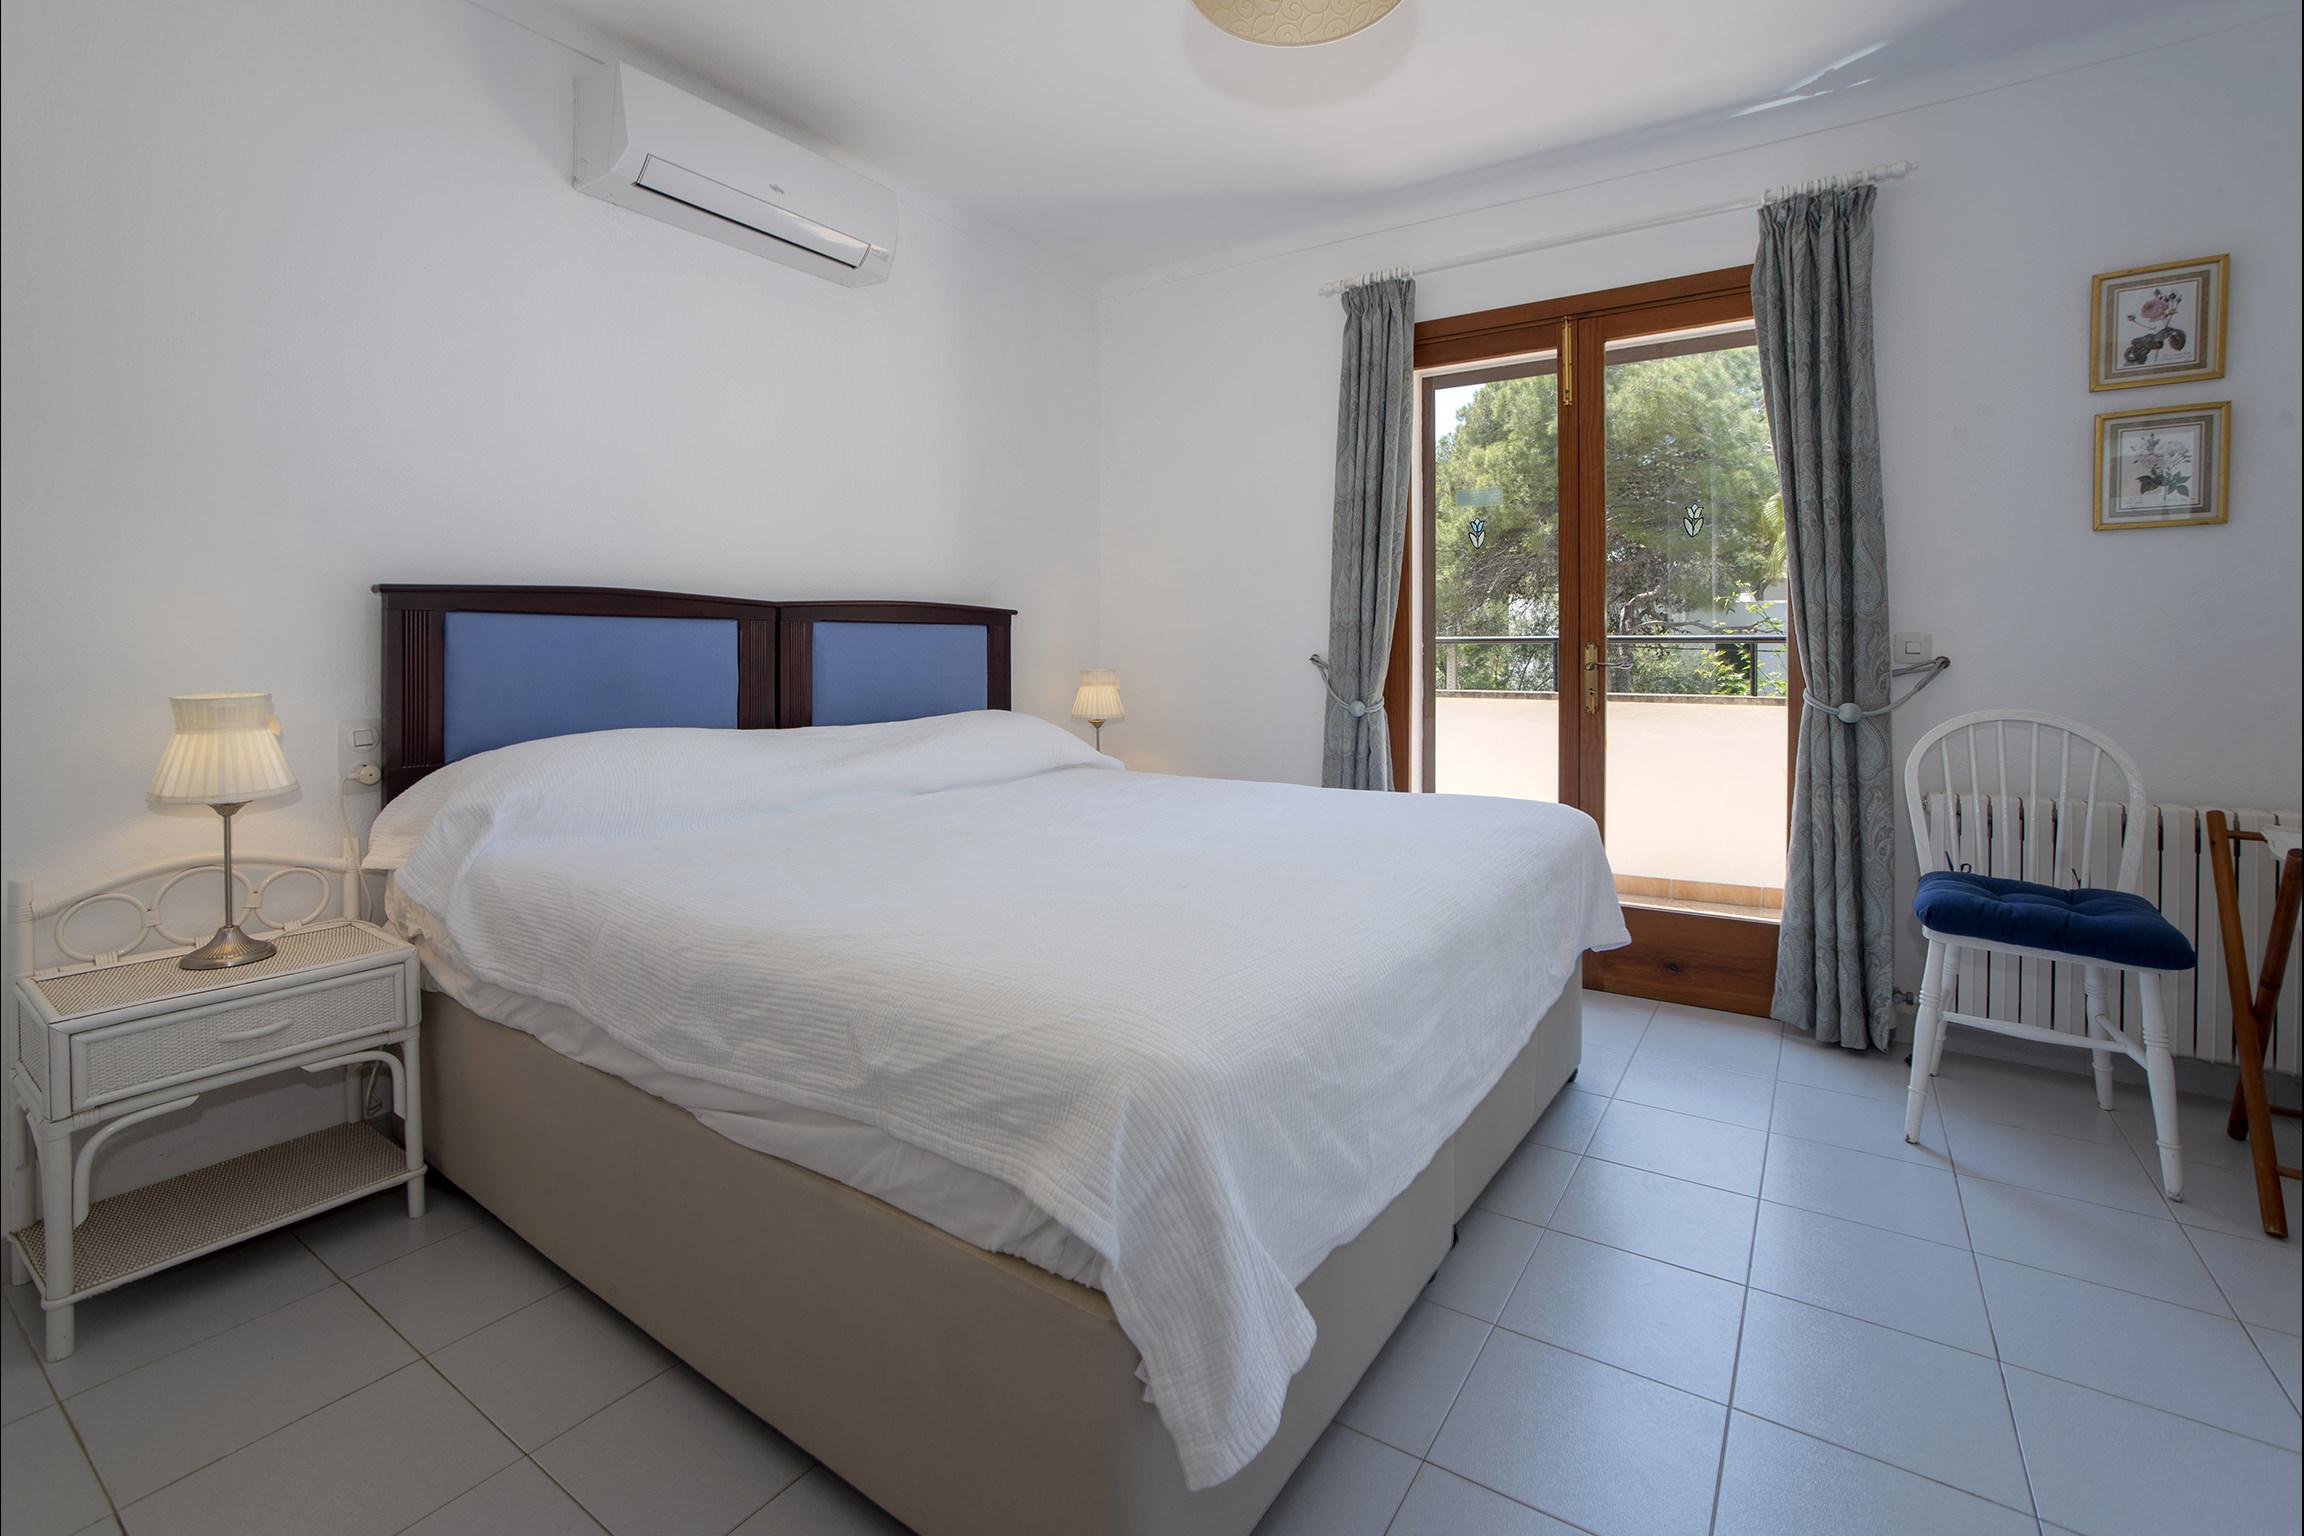 Apartment Casa Baskings photo 20309981